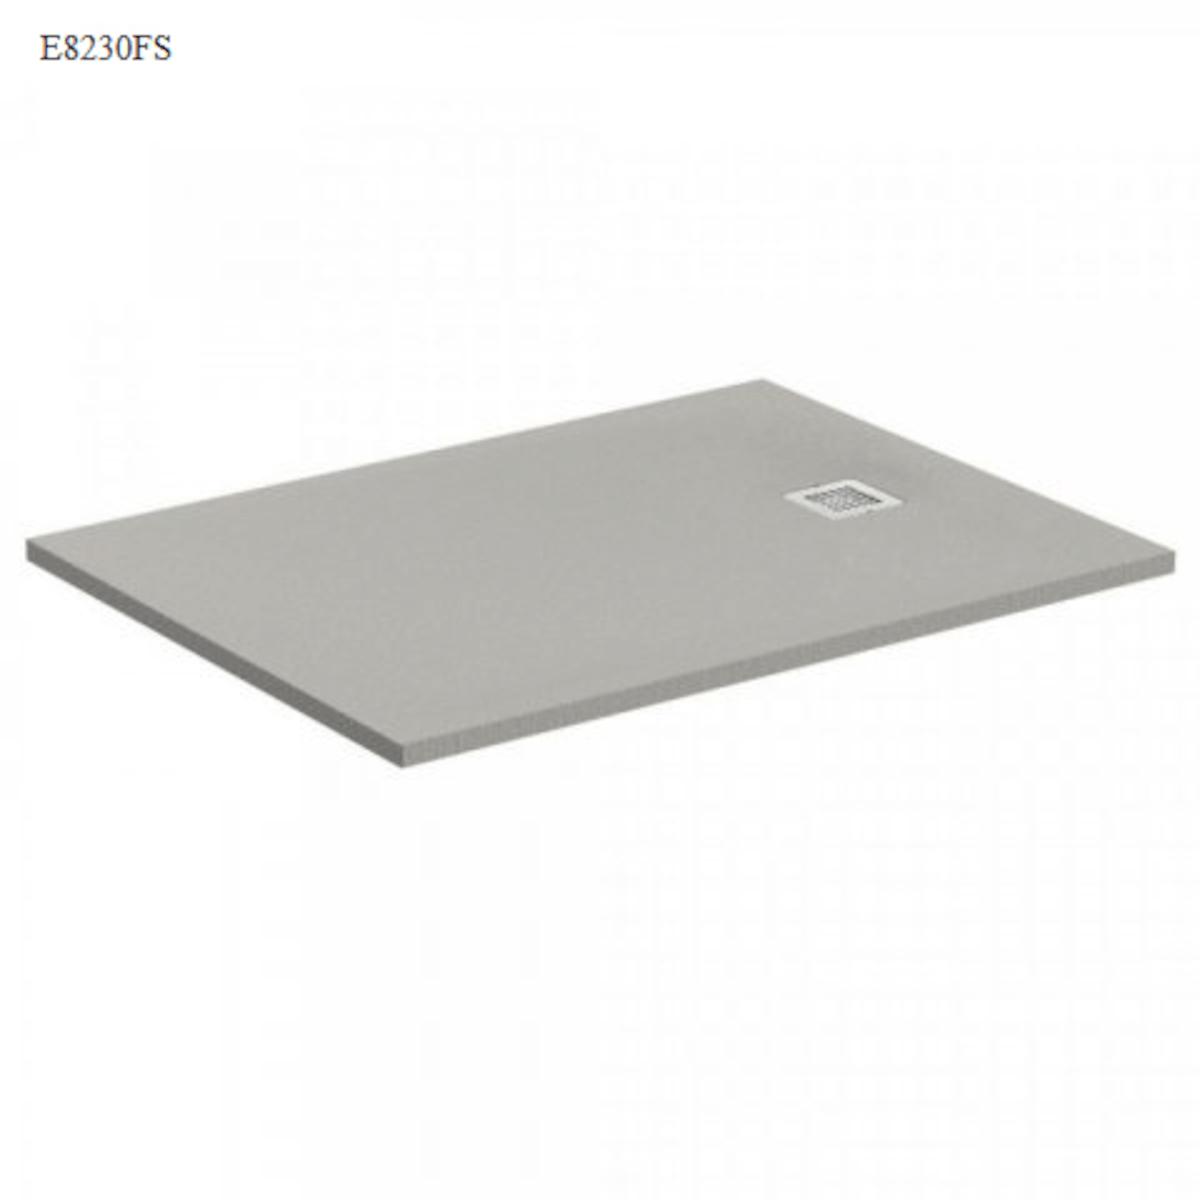 Sprchová vanička obdĺžniková Ideal Standard Ultraflat S 120x90 cm liaty mramor šedá K8230FS